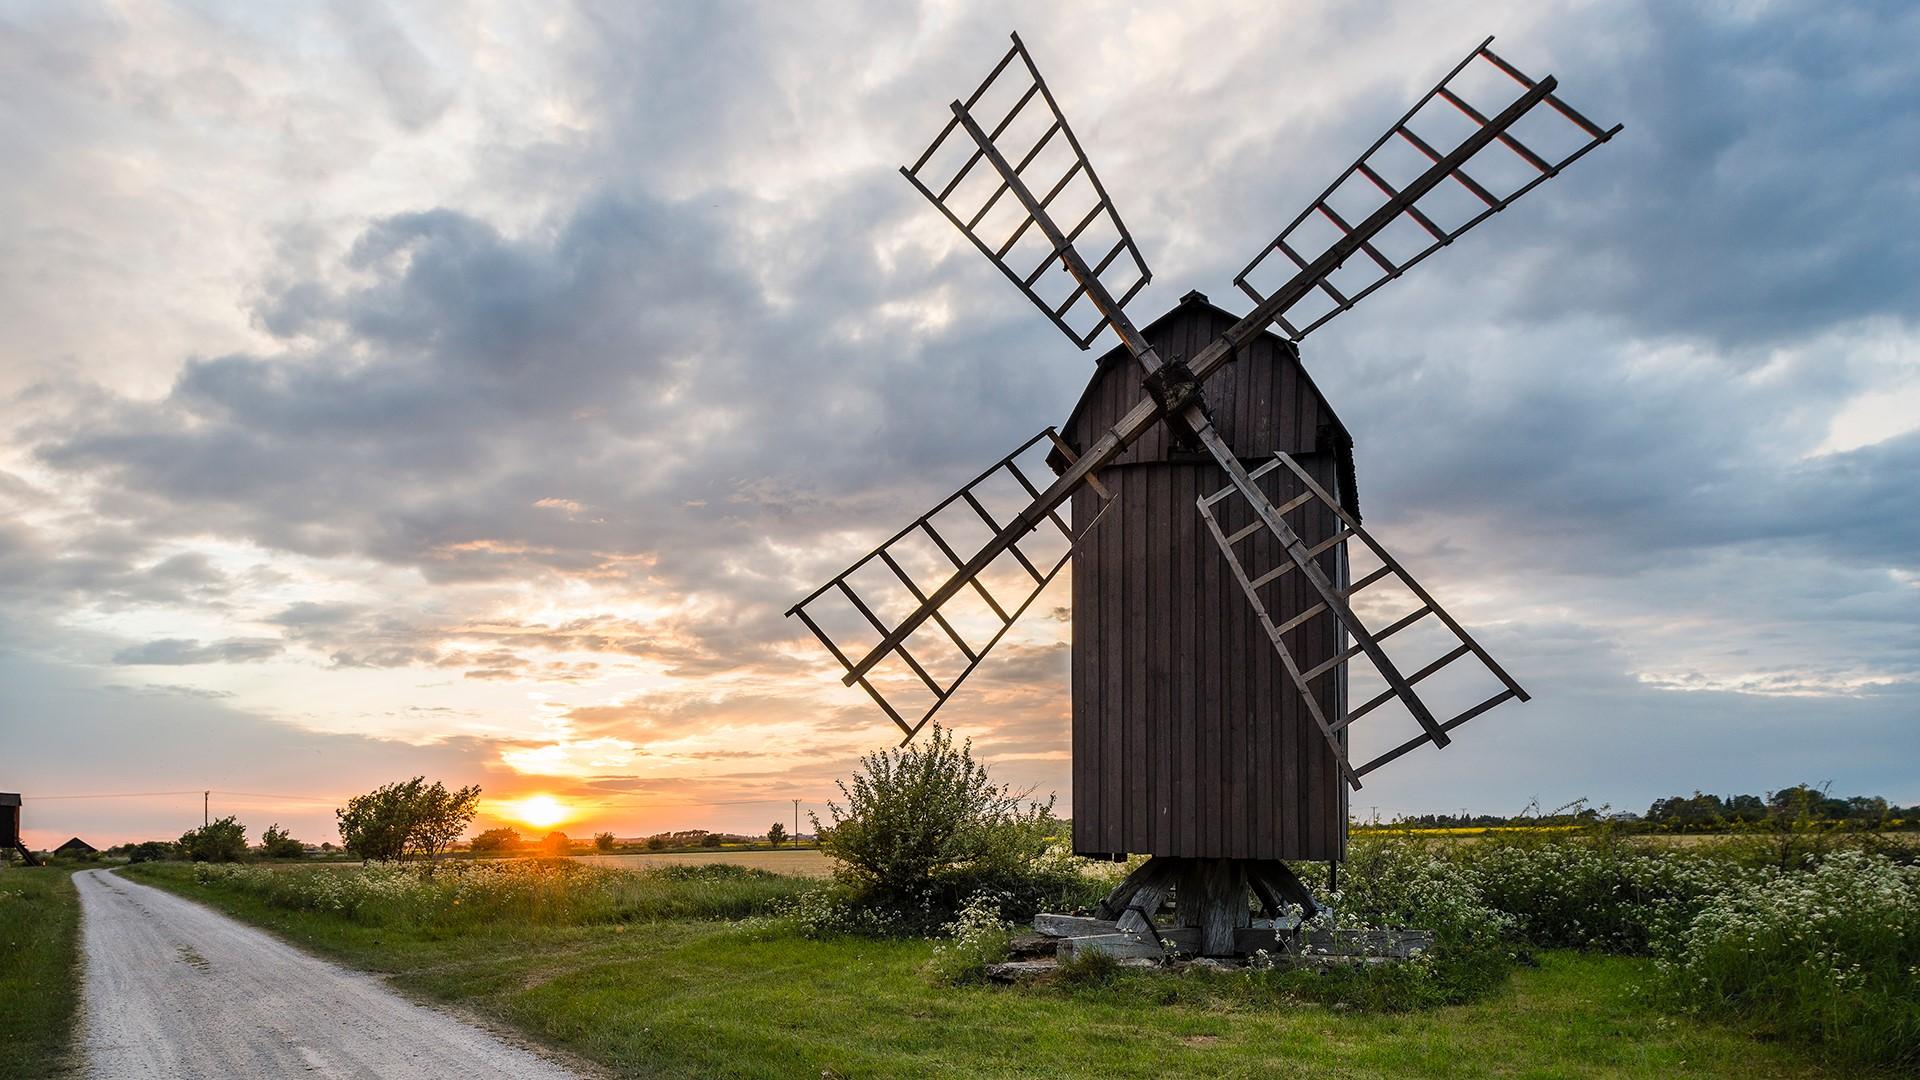 Windmill at sunset, Öland, Sweden   Windows 10 SpotLight